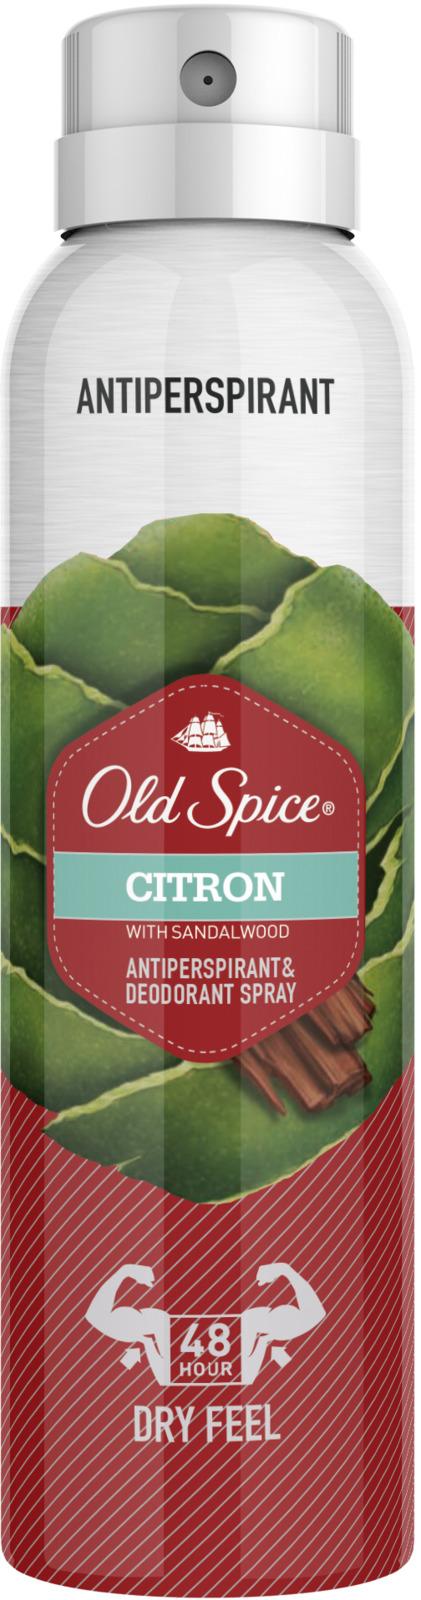 Дезодорант-антиперспирант аэрозольный Old Spice Citron, 150 мл